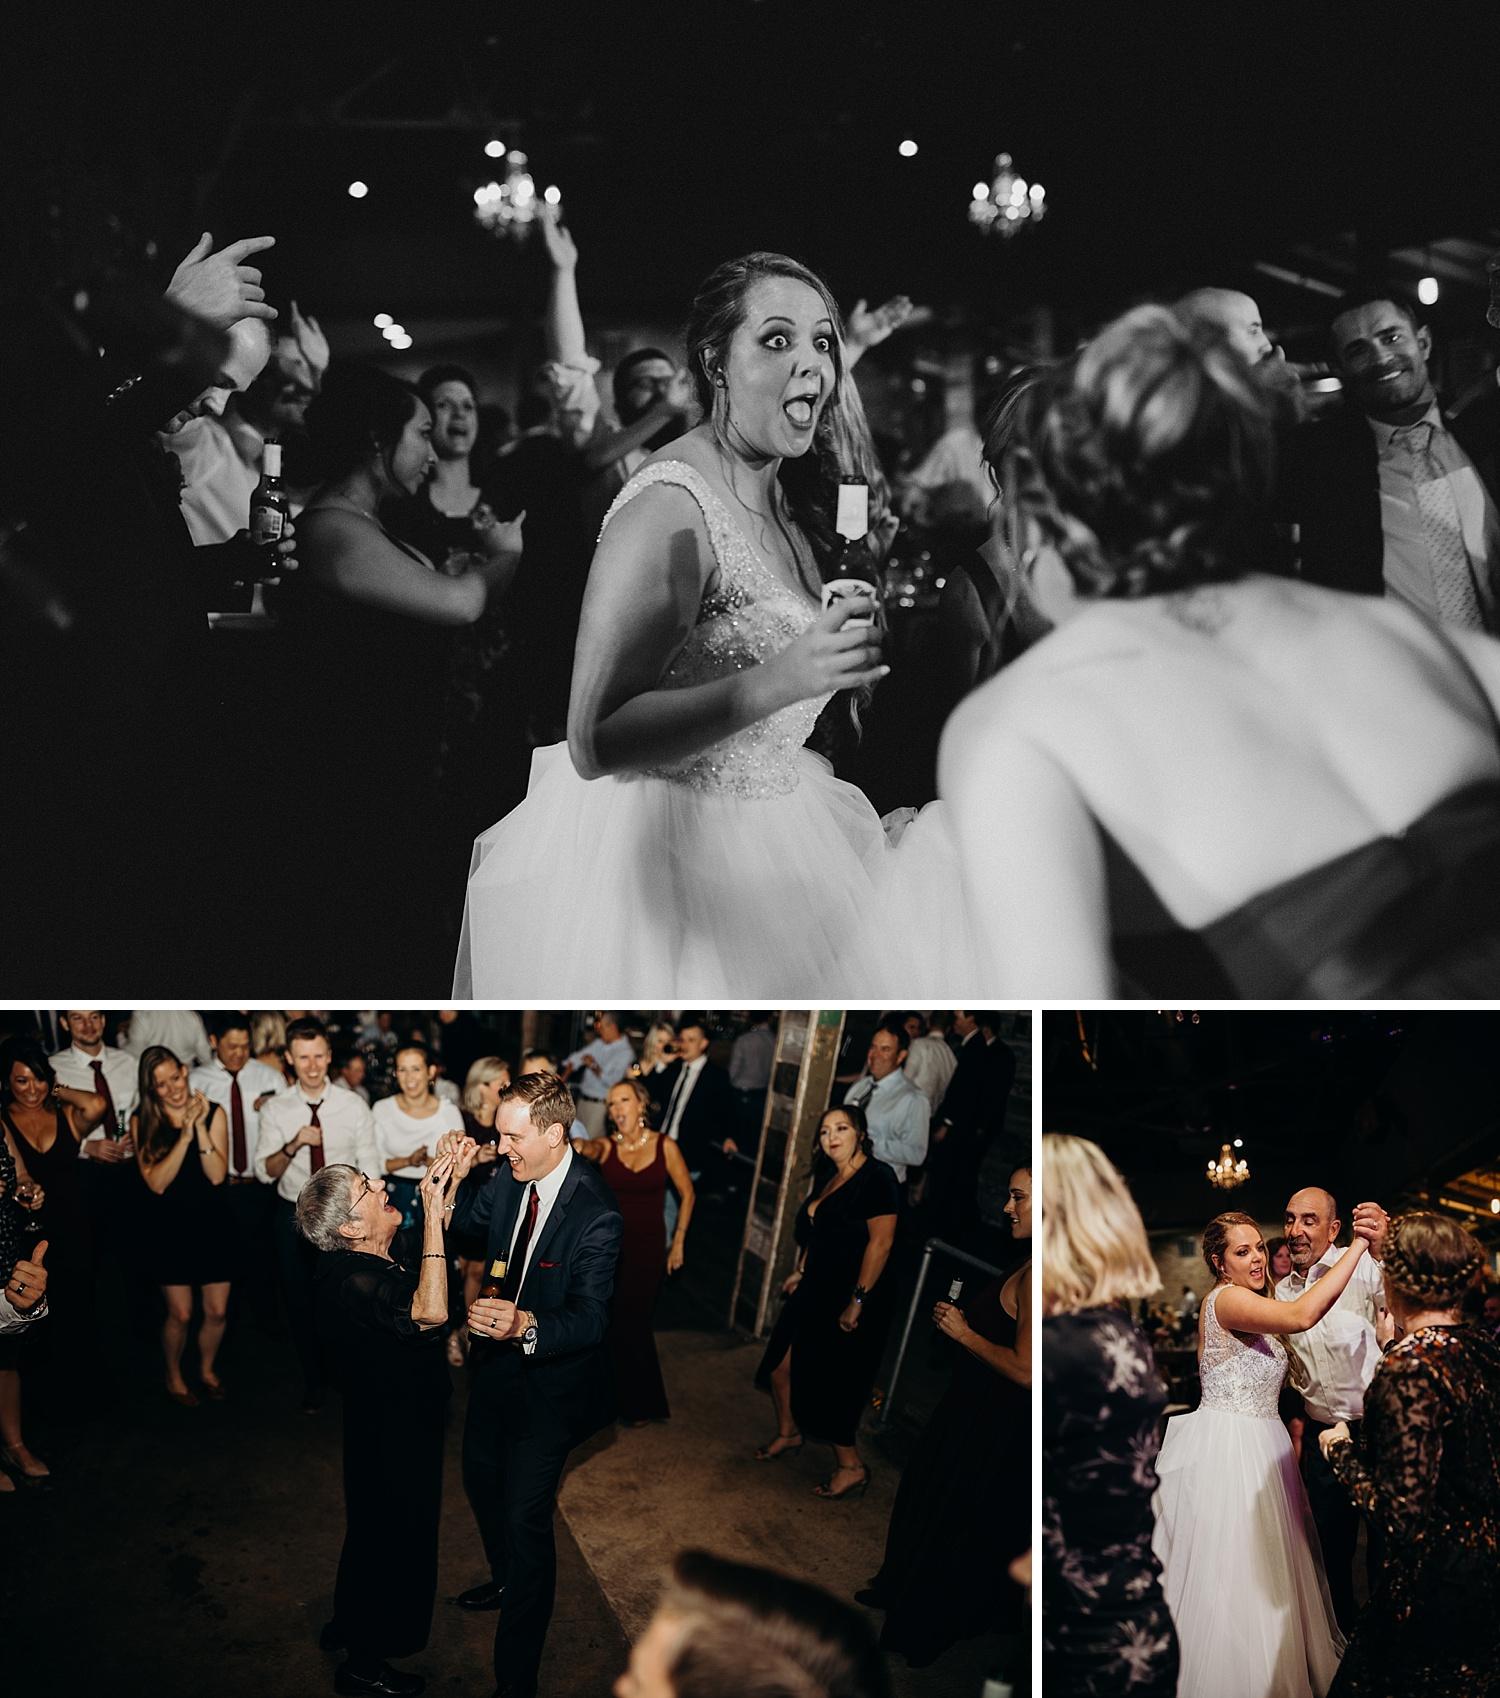 BrittanyGilbertPhotography_Wedding_MOPAC10.jpg